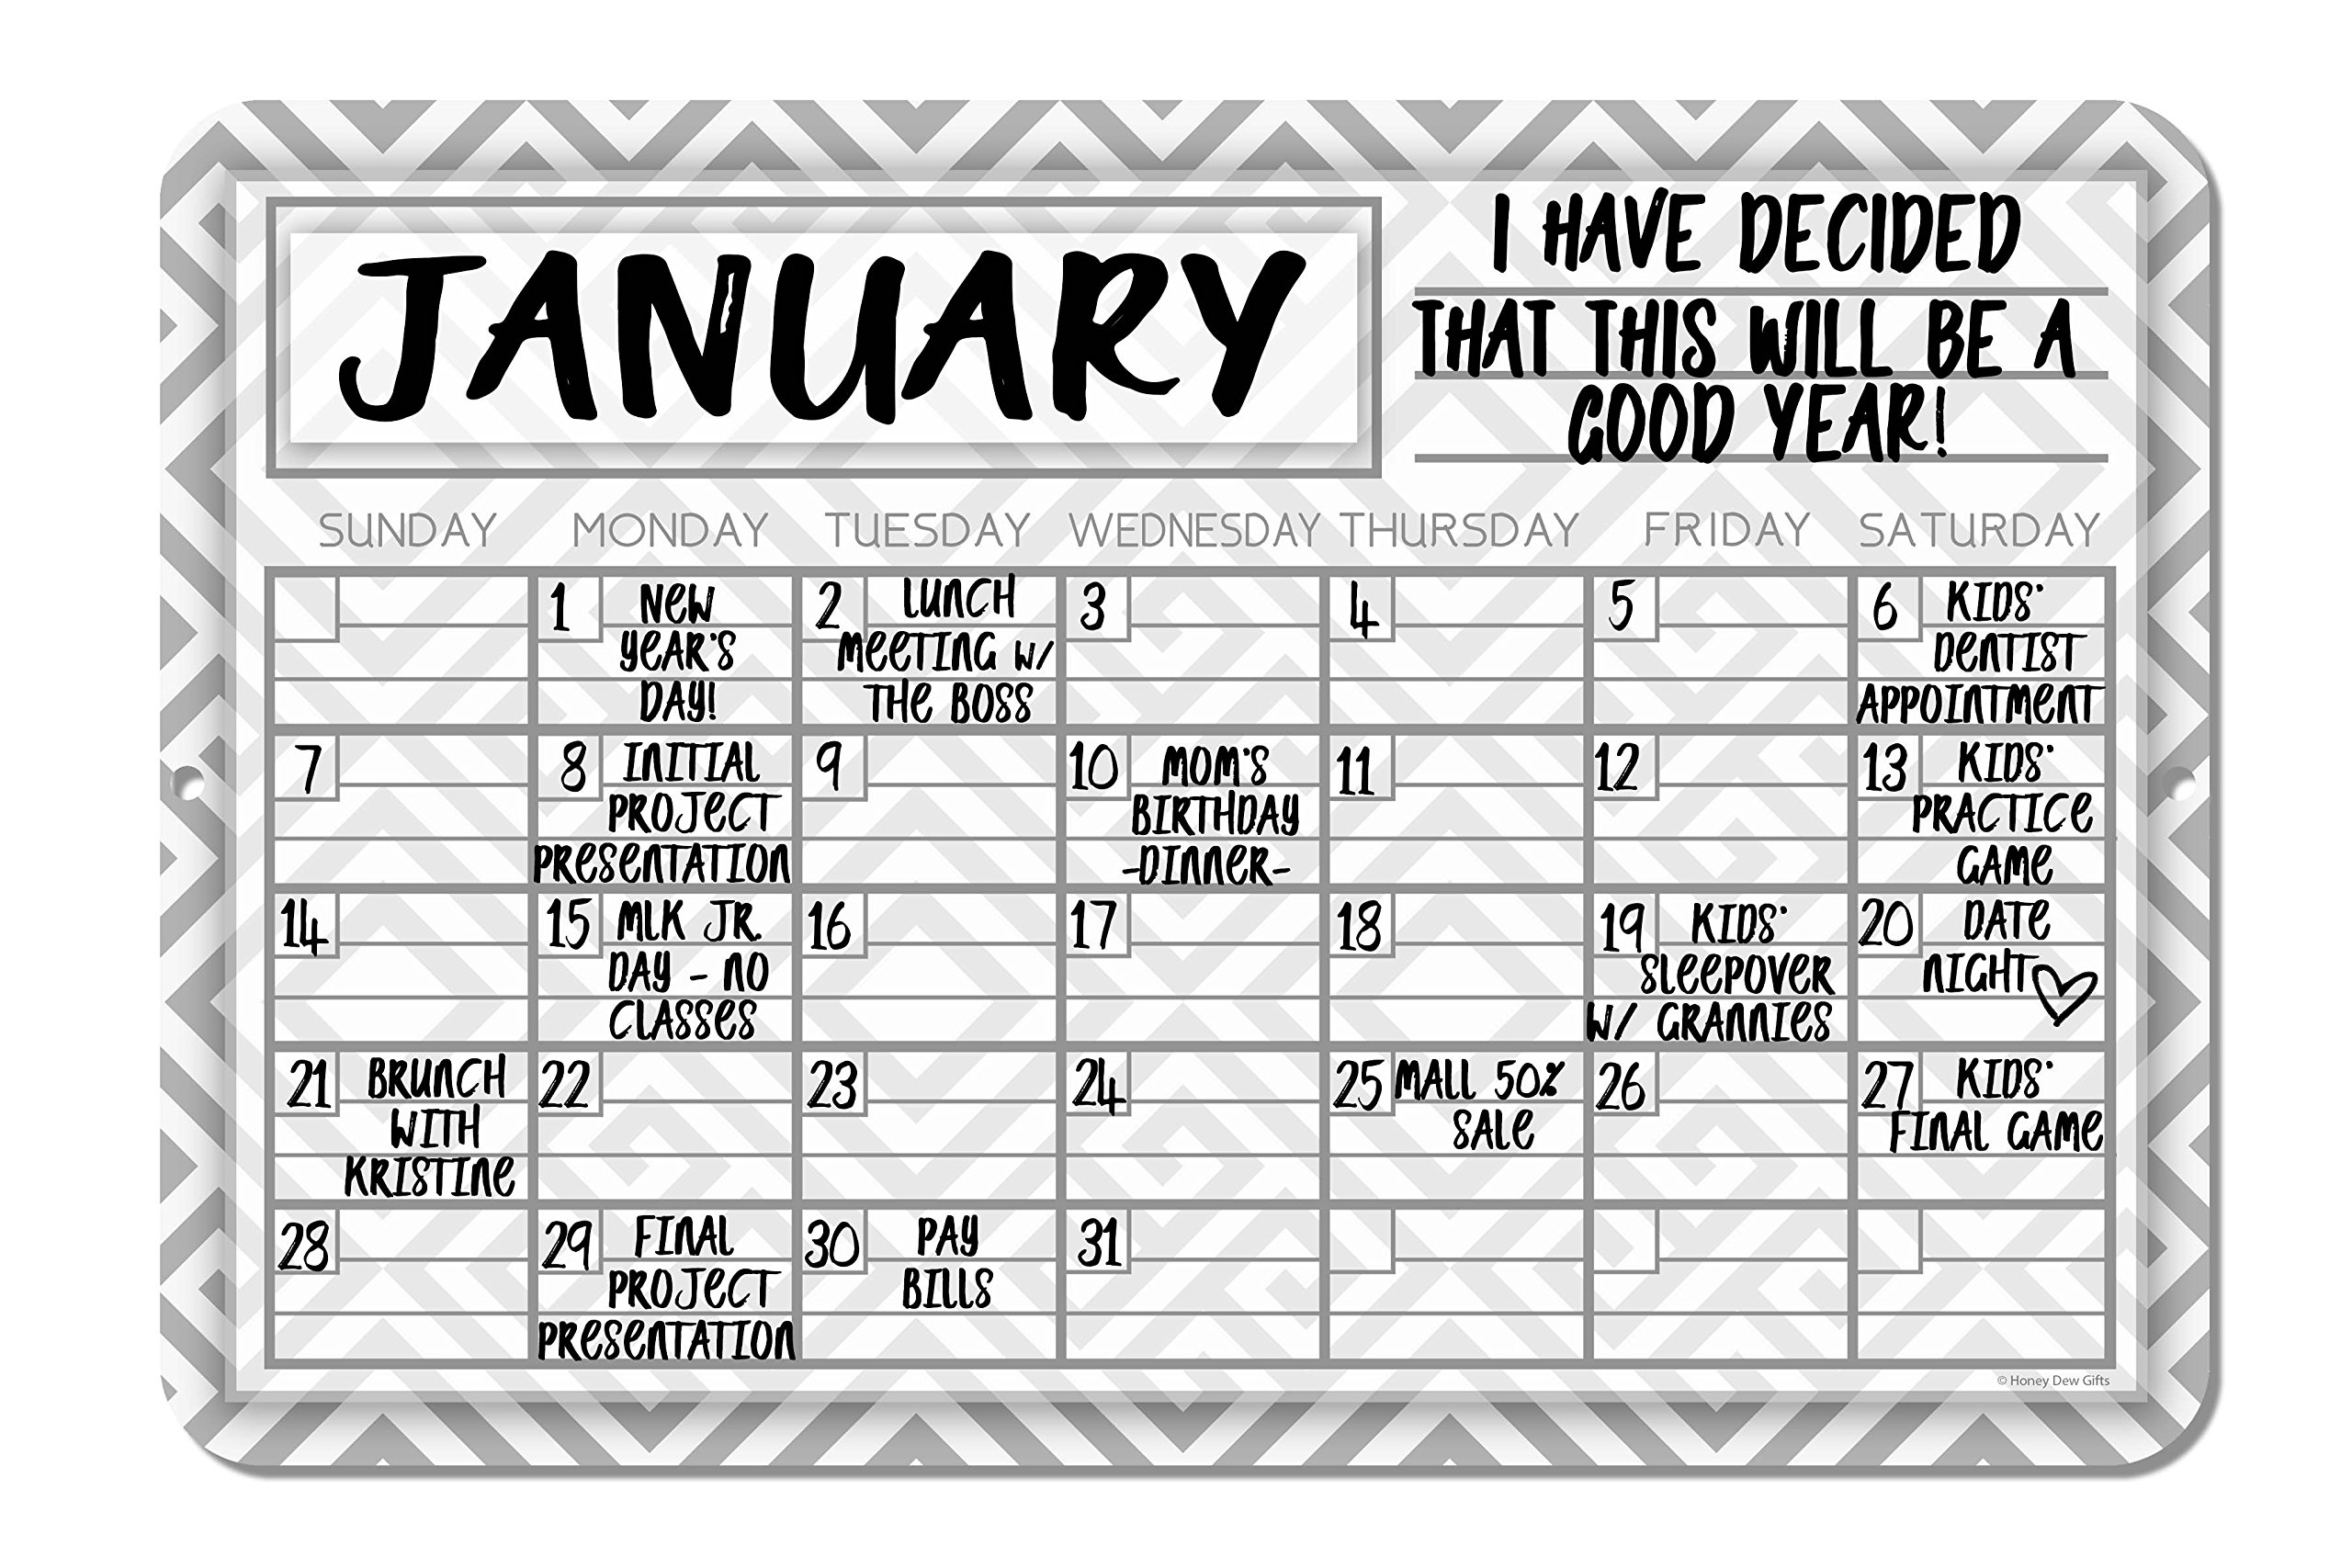 Gray Geometric Pattern Decorative Wall Calendar Planning Board - Reusable Easy Clean